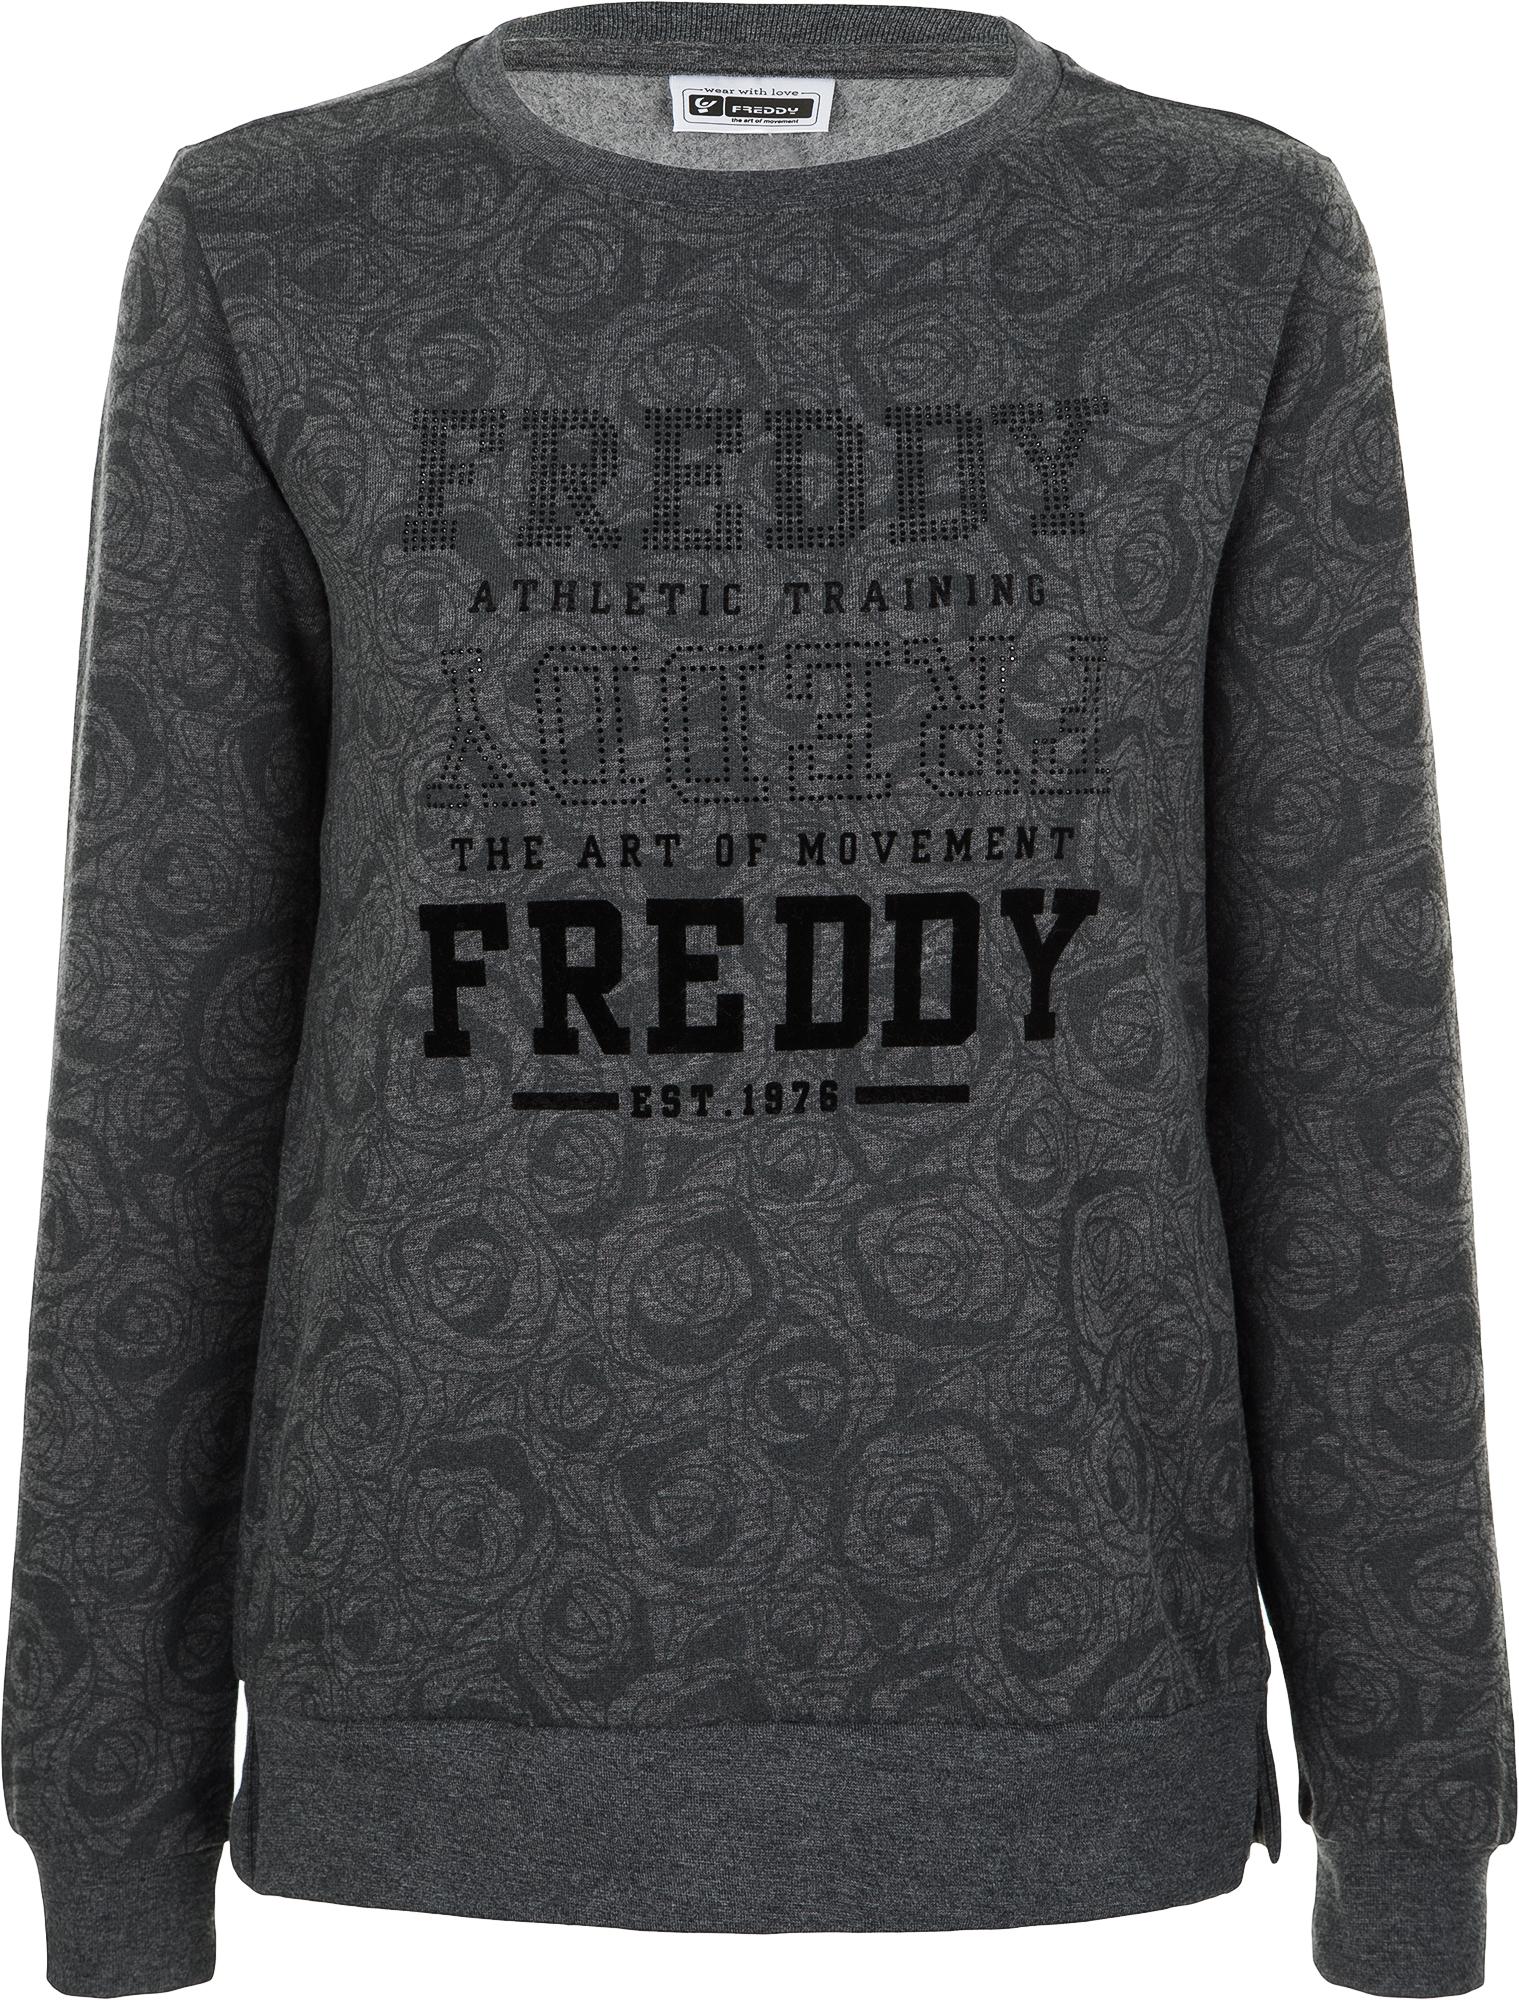 Freddy Свитшот женский Freddy, размер 48-50 недорго, оригинальная цена